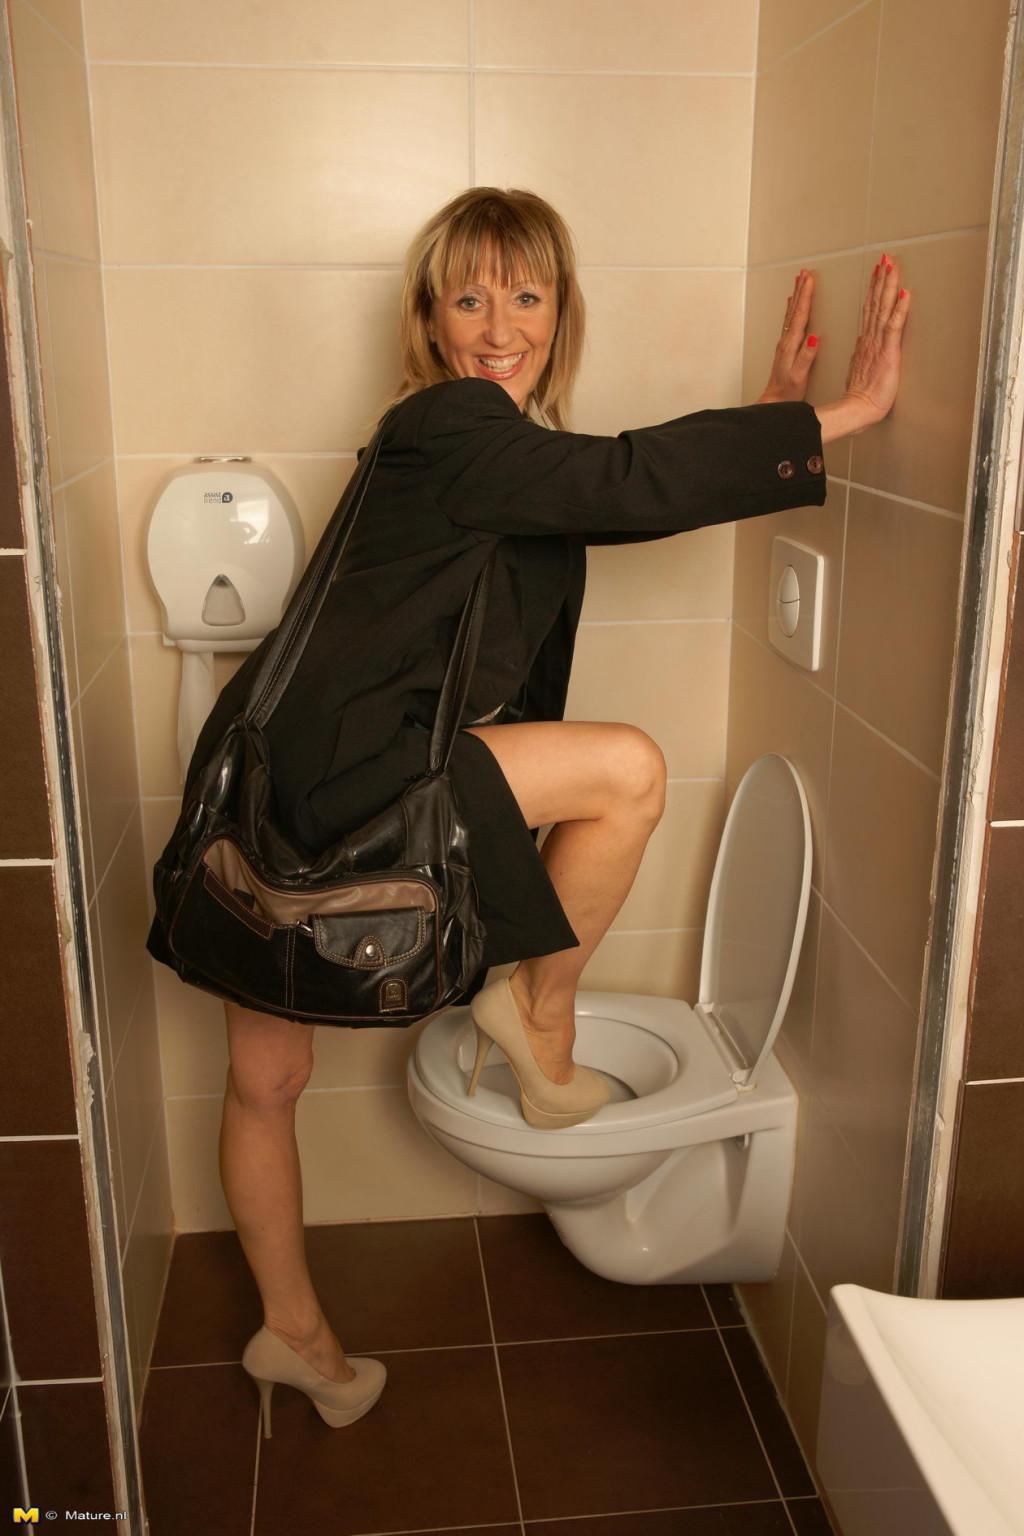 Horny mature slut fucking on a toilet pichunter jpg 1024x1536 70 year old  sluts